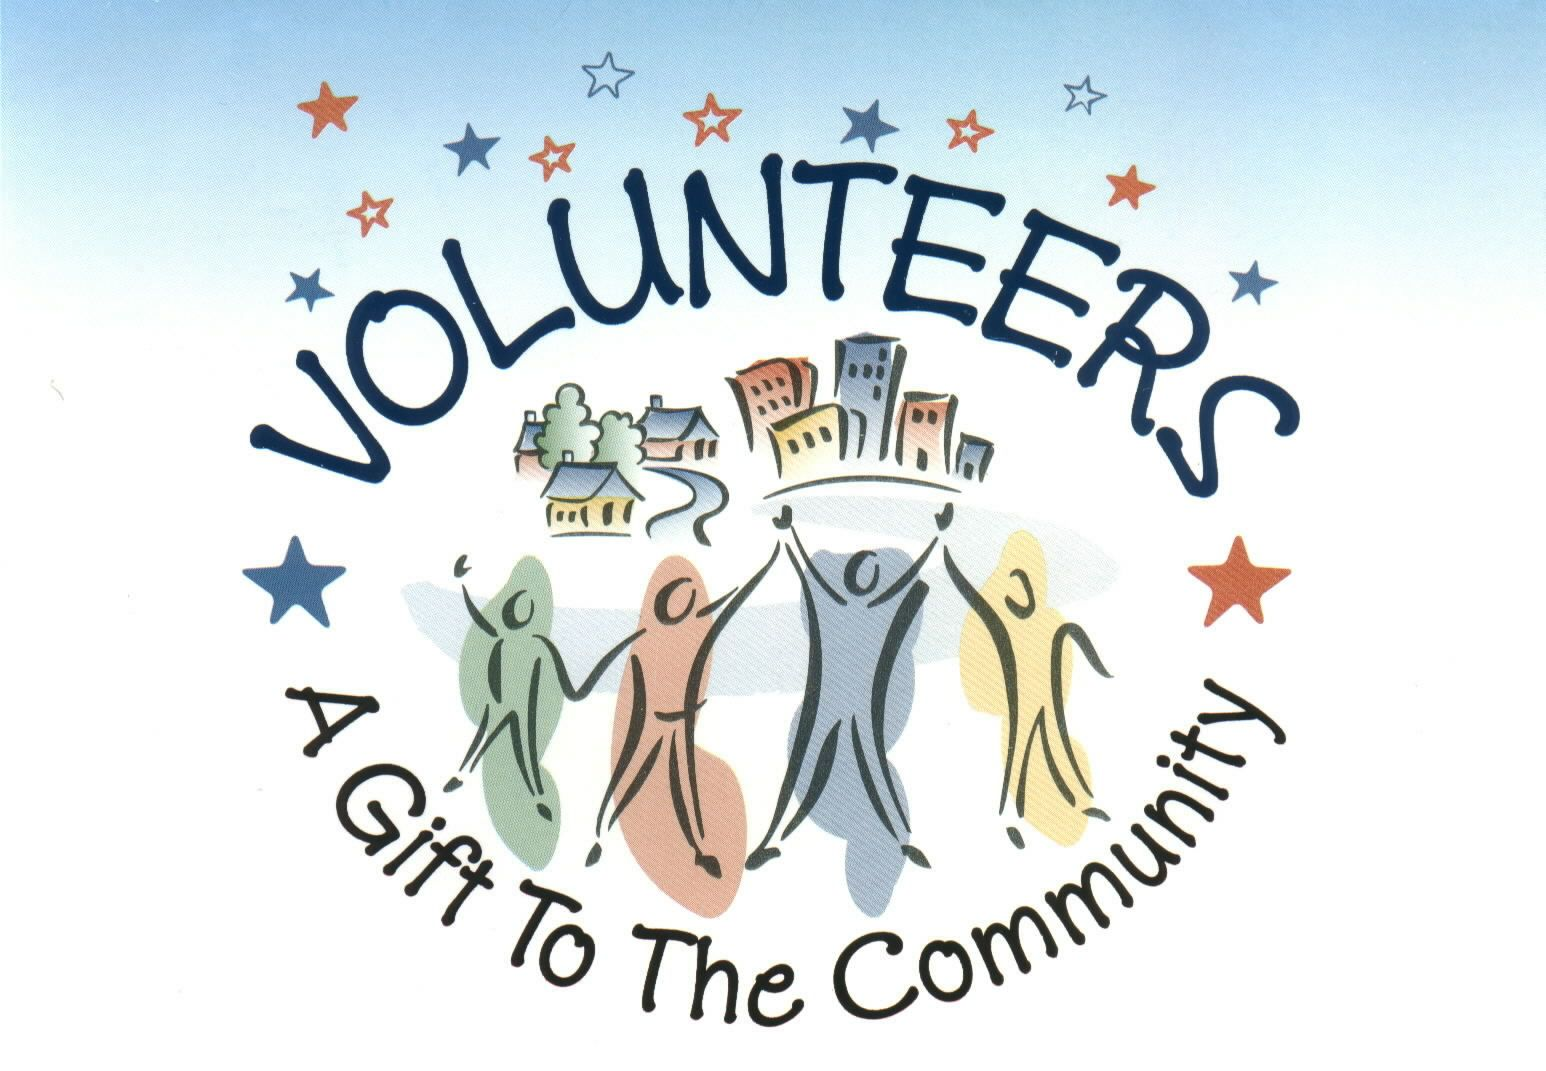 Volunteering clipart voluntary.  ways how the